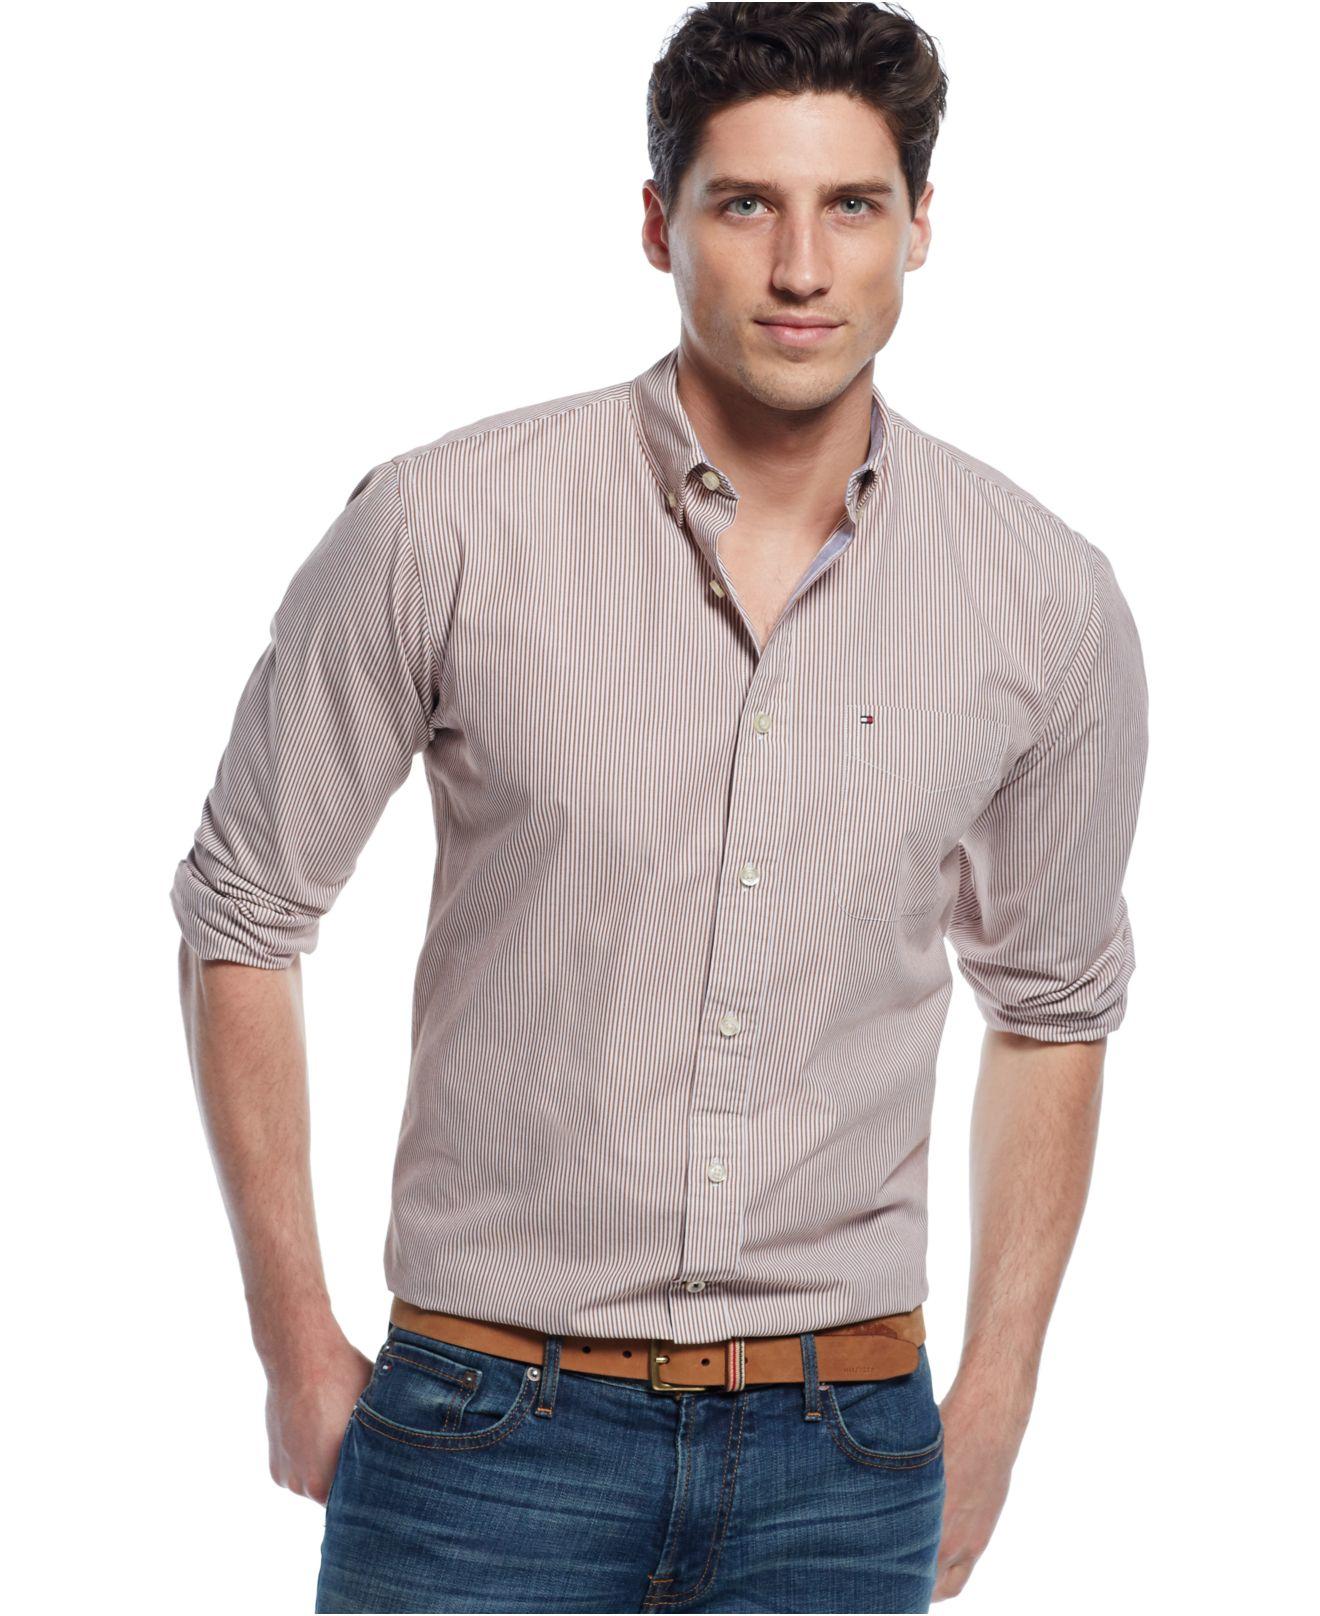 Tommy hilfiger fitzgerald striped shirt in brown for men for Tommy hilfiger fitzgerald striped shirt